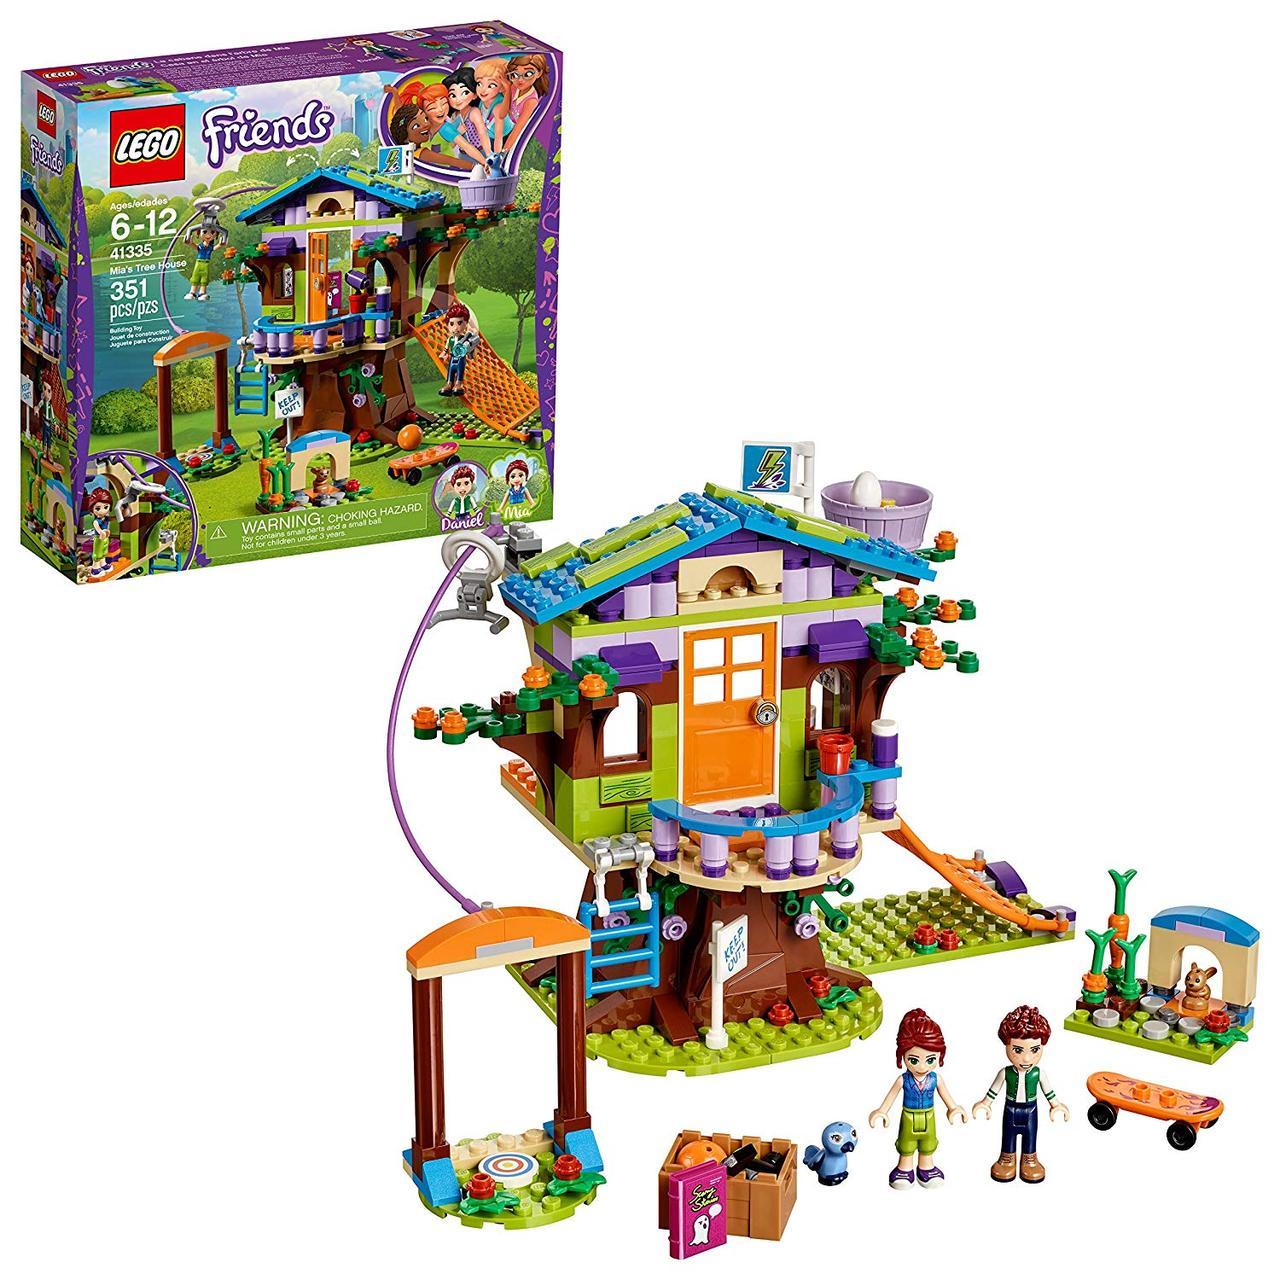 LEGO конструктор лего Домик на дереве Мии 351 деталь Friends Mia's Tree House 41335